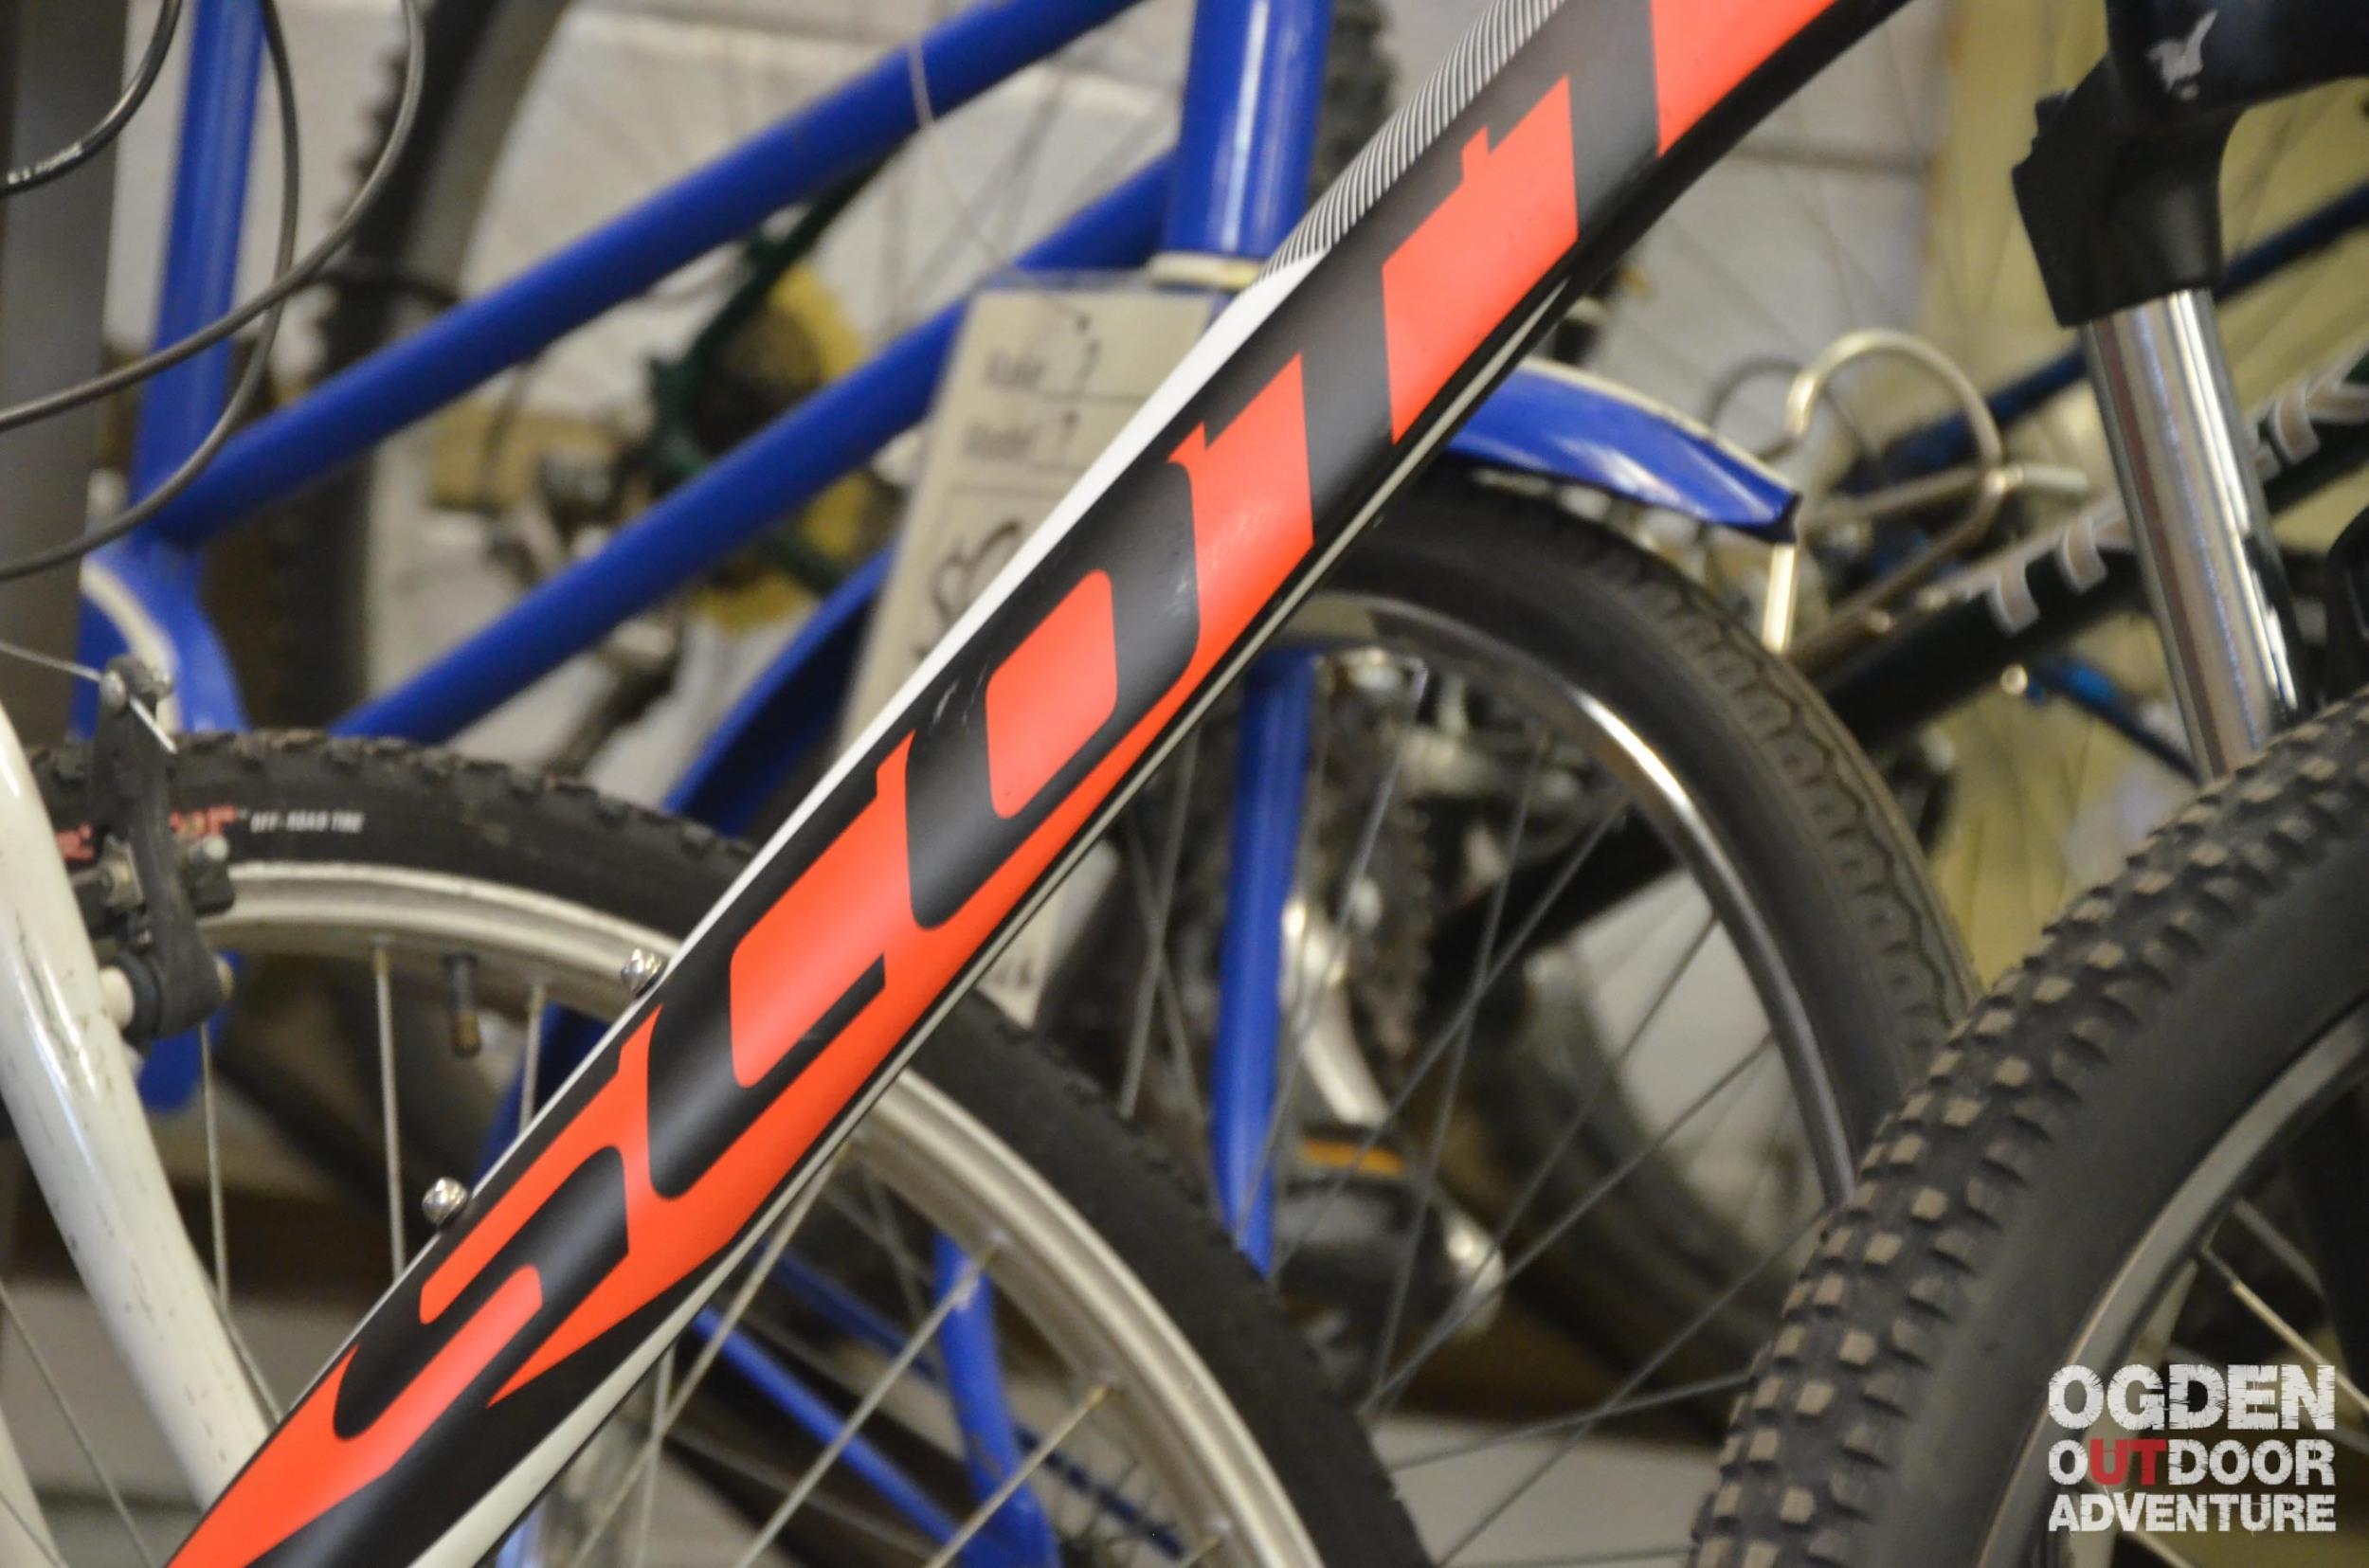 Ogden Bike Collective-16.jpg